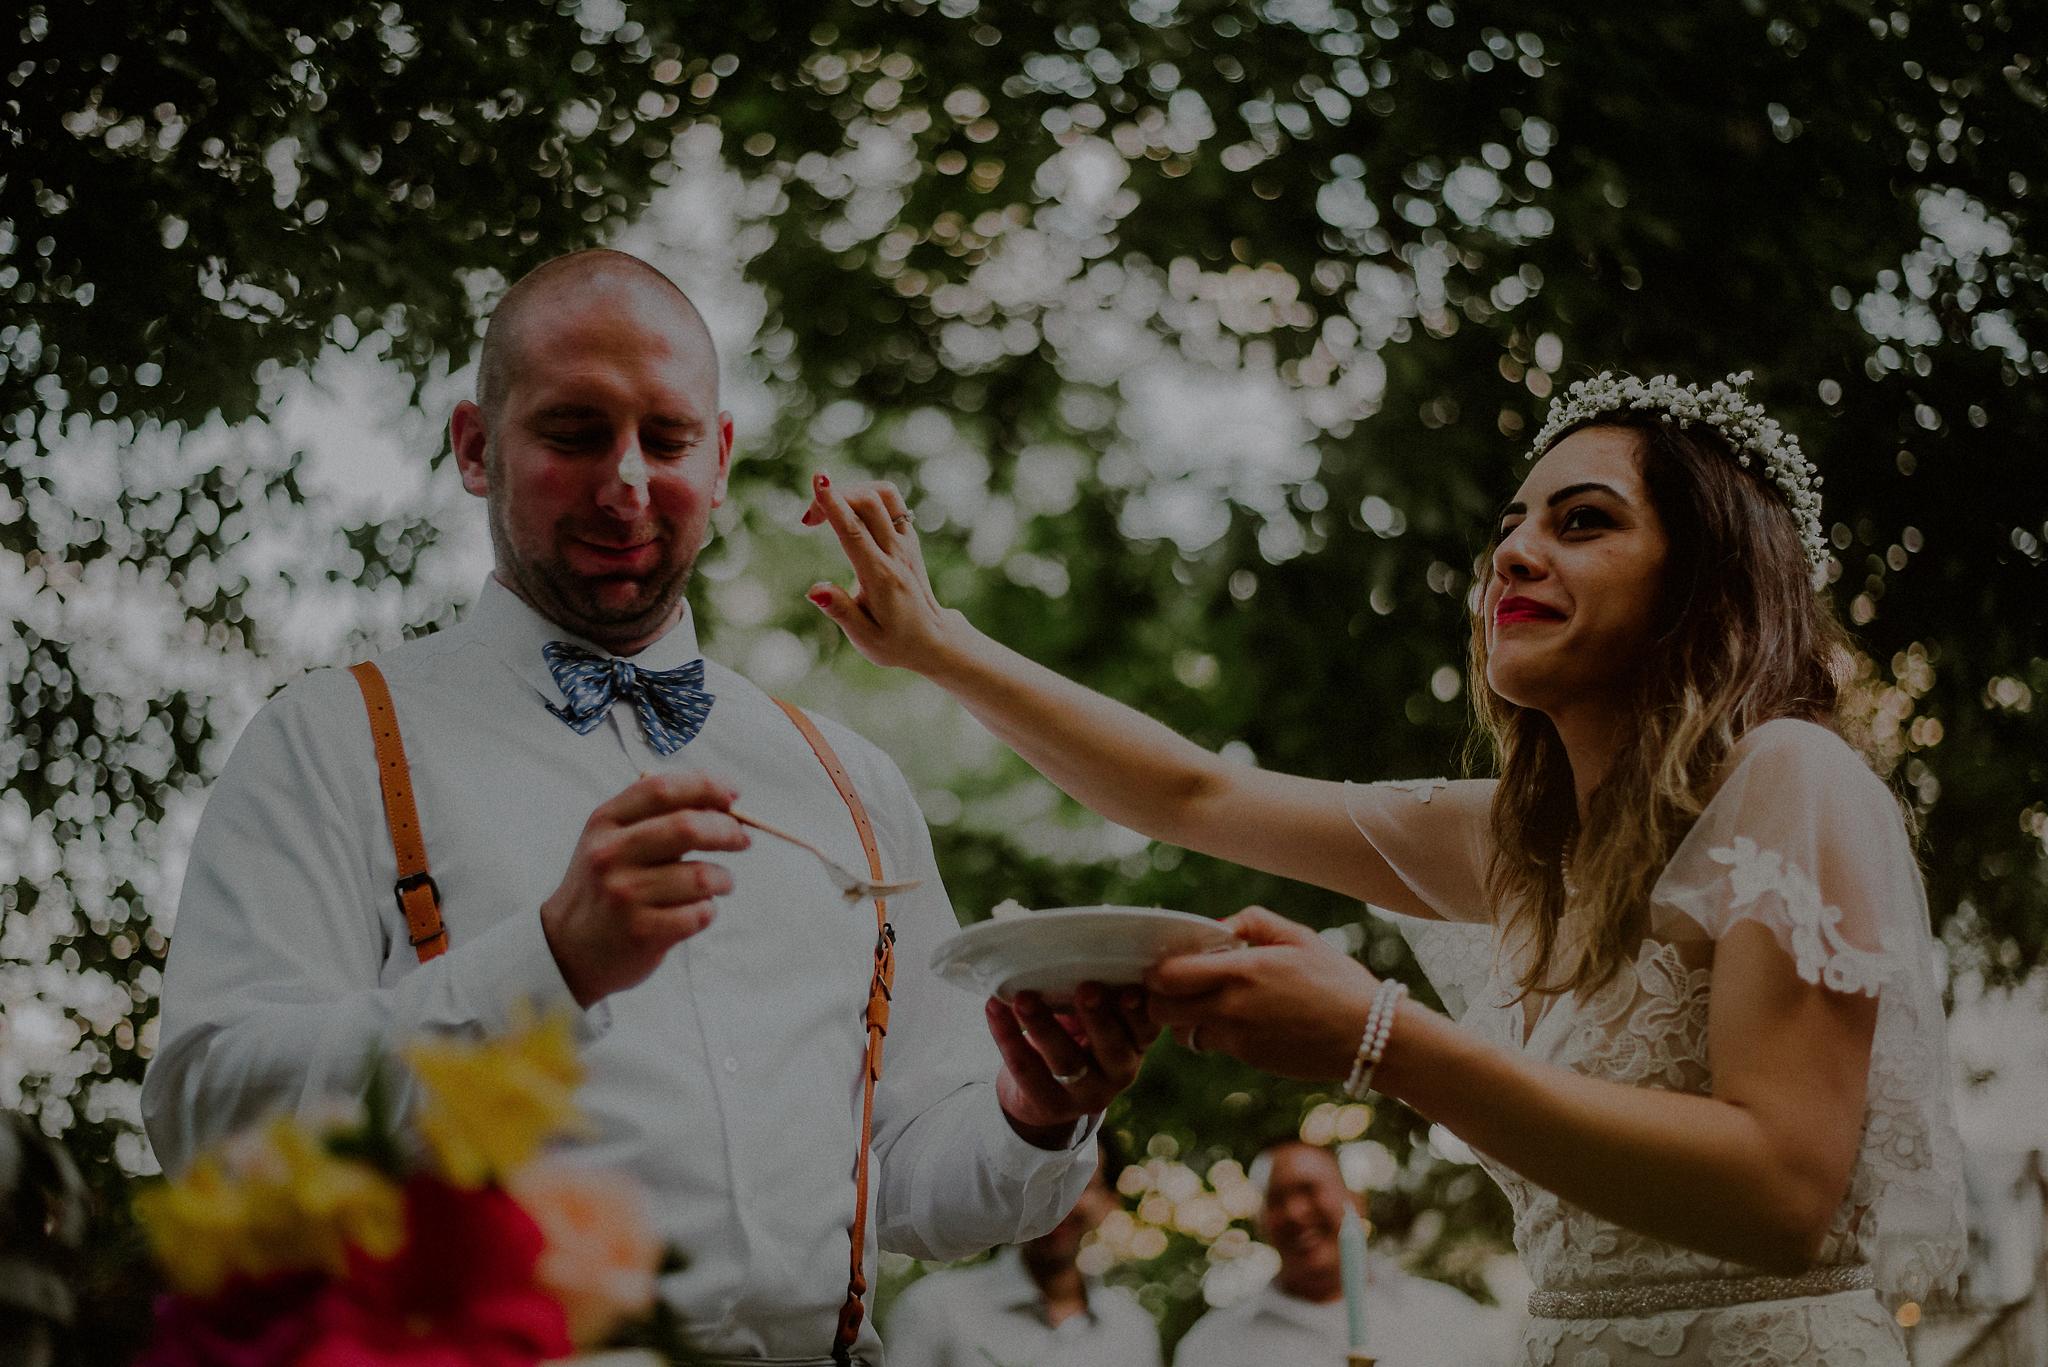 multicultural wedding photos